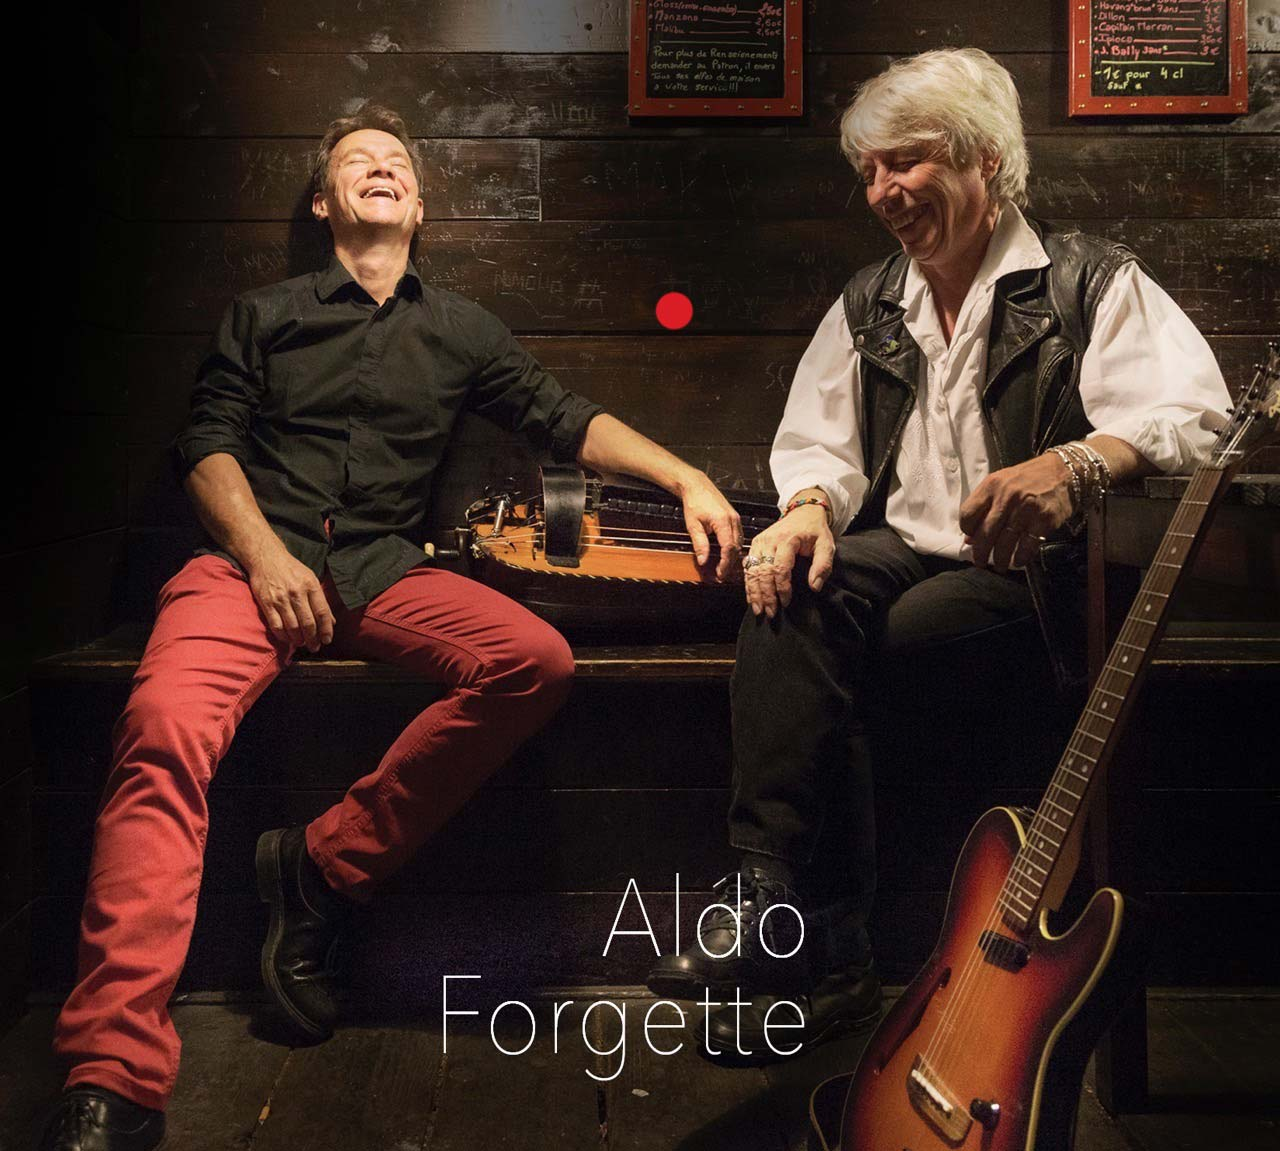 La Compagnie Bérot - Aldo Forgette